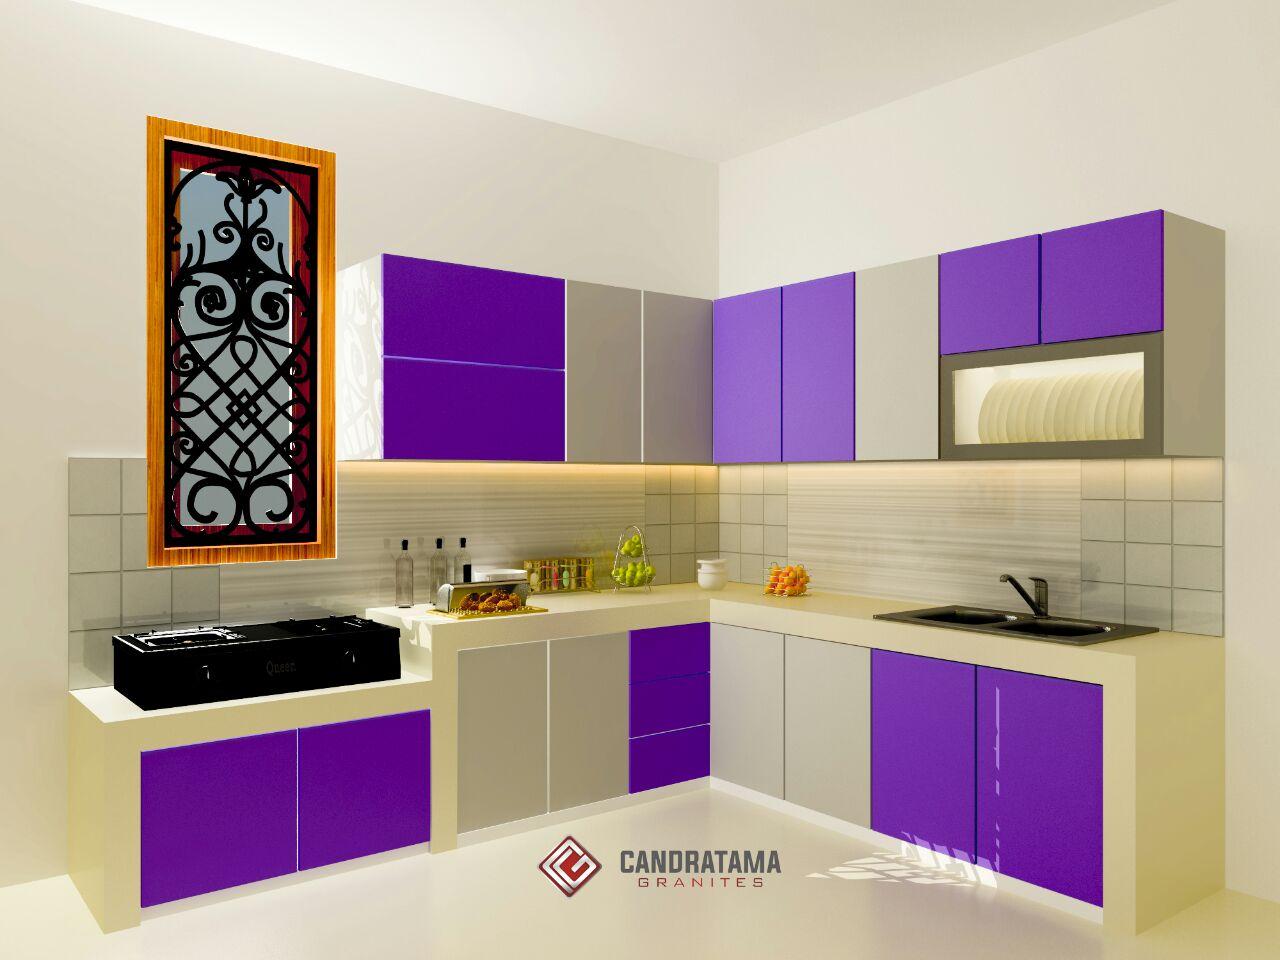 3 Desain Kitchen Set Warna Ungu Kitchen Set Nganjuk Kitchen Set